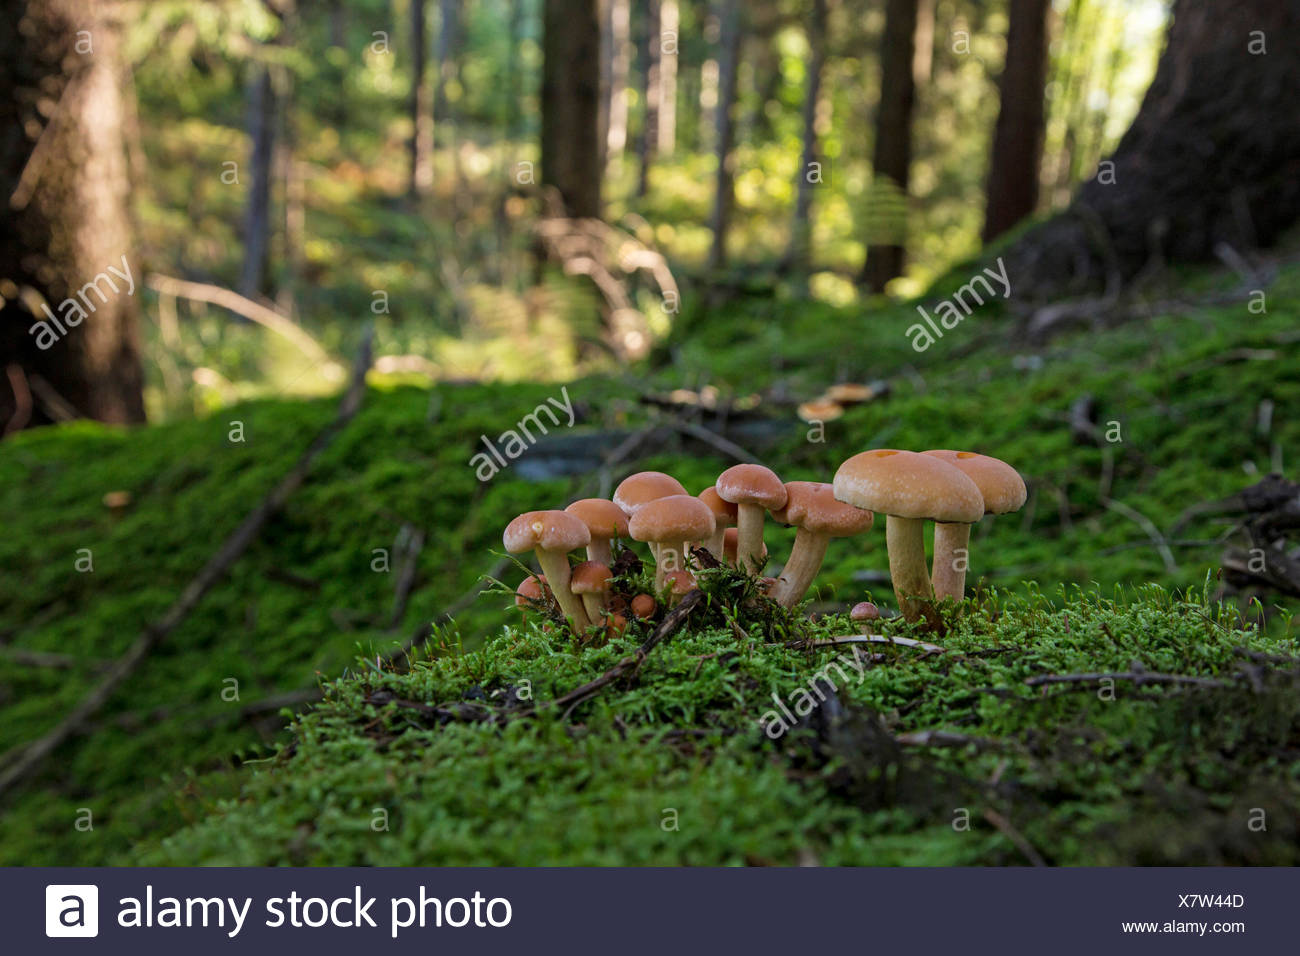 Dark honey fungus, Honey mushroom (Armillaria ostoyae, Armillariella polymyces, Armillaria solidipes), fruiting bodies on a mossy tree snag, Germany, Bavaria - Stock Image